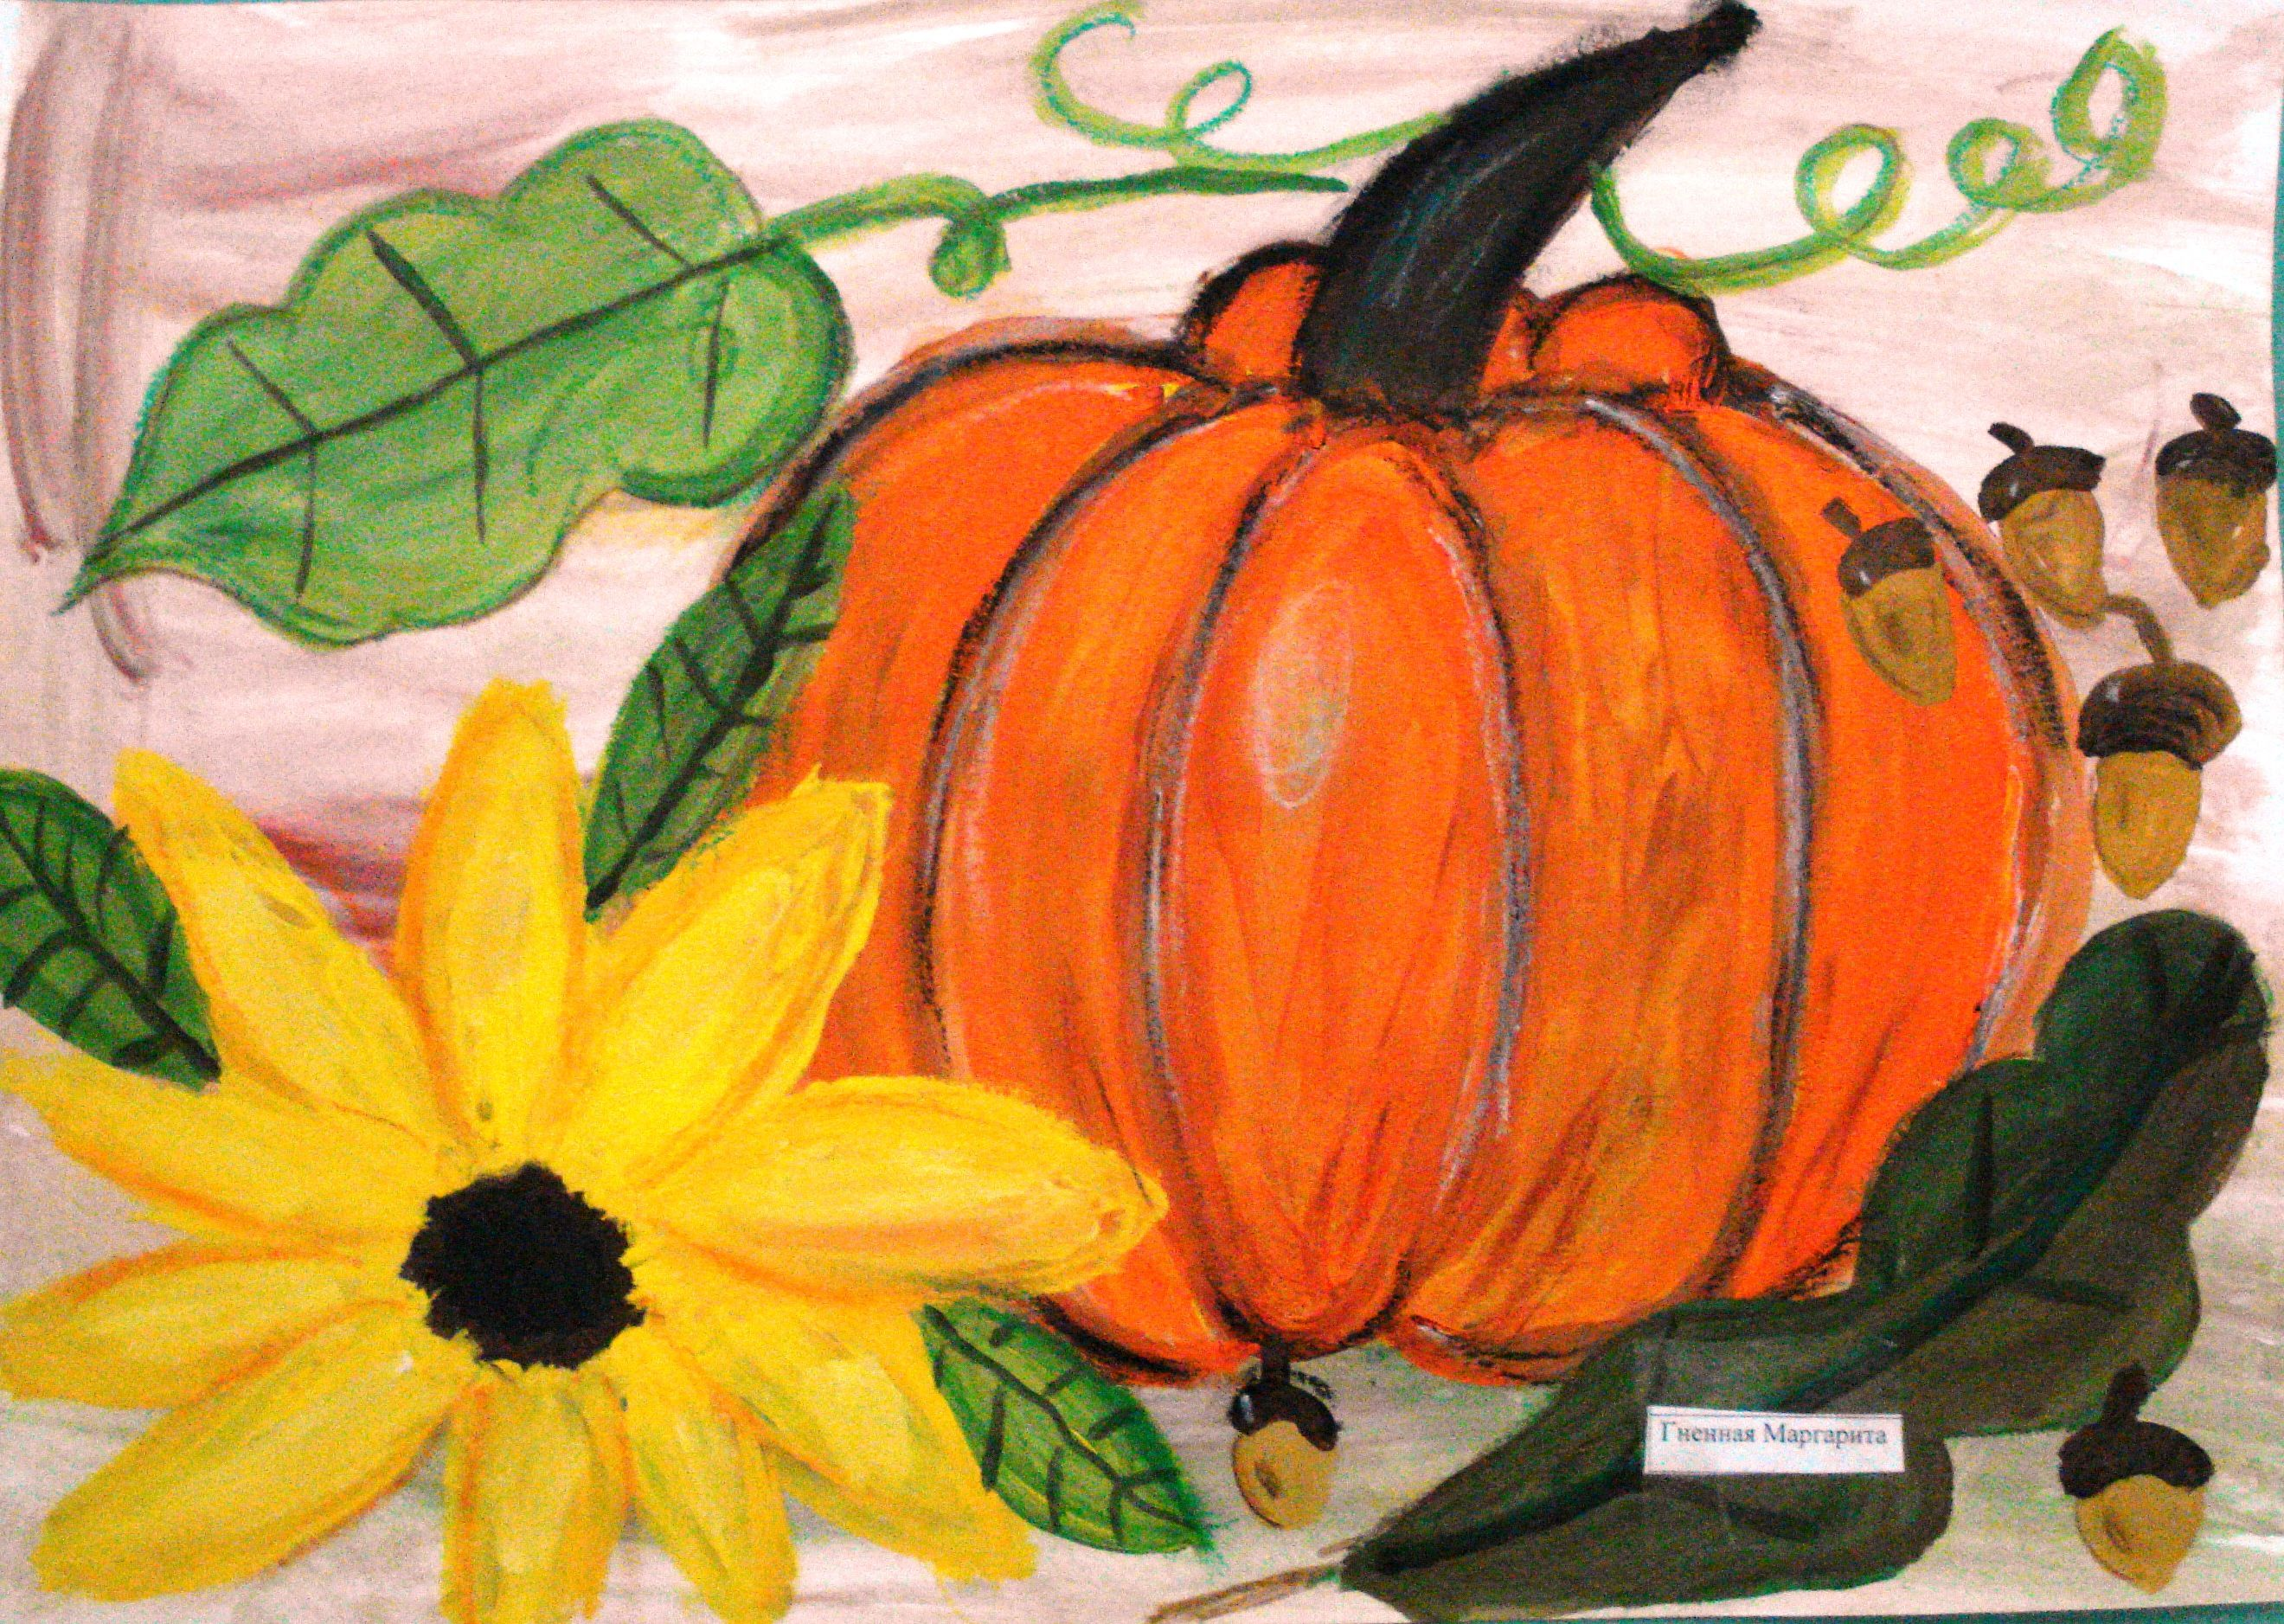 Pin de Tara Ferguson-Stevenson en 2nd grade | Pinterest | Colorear ...